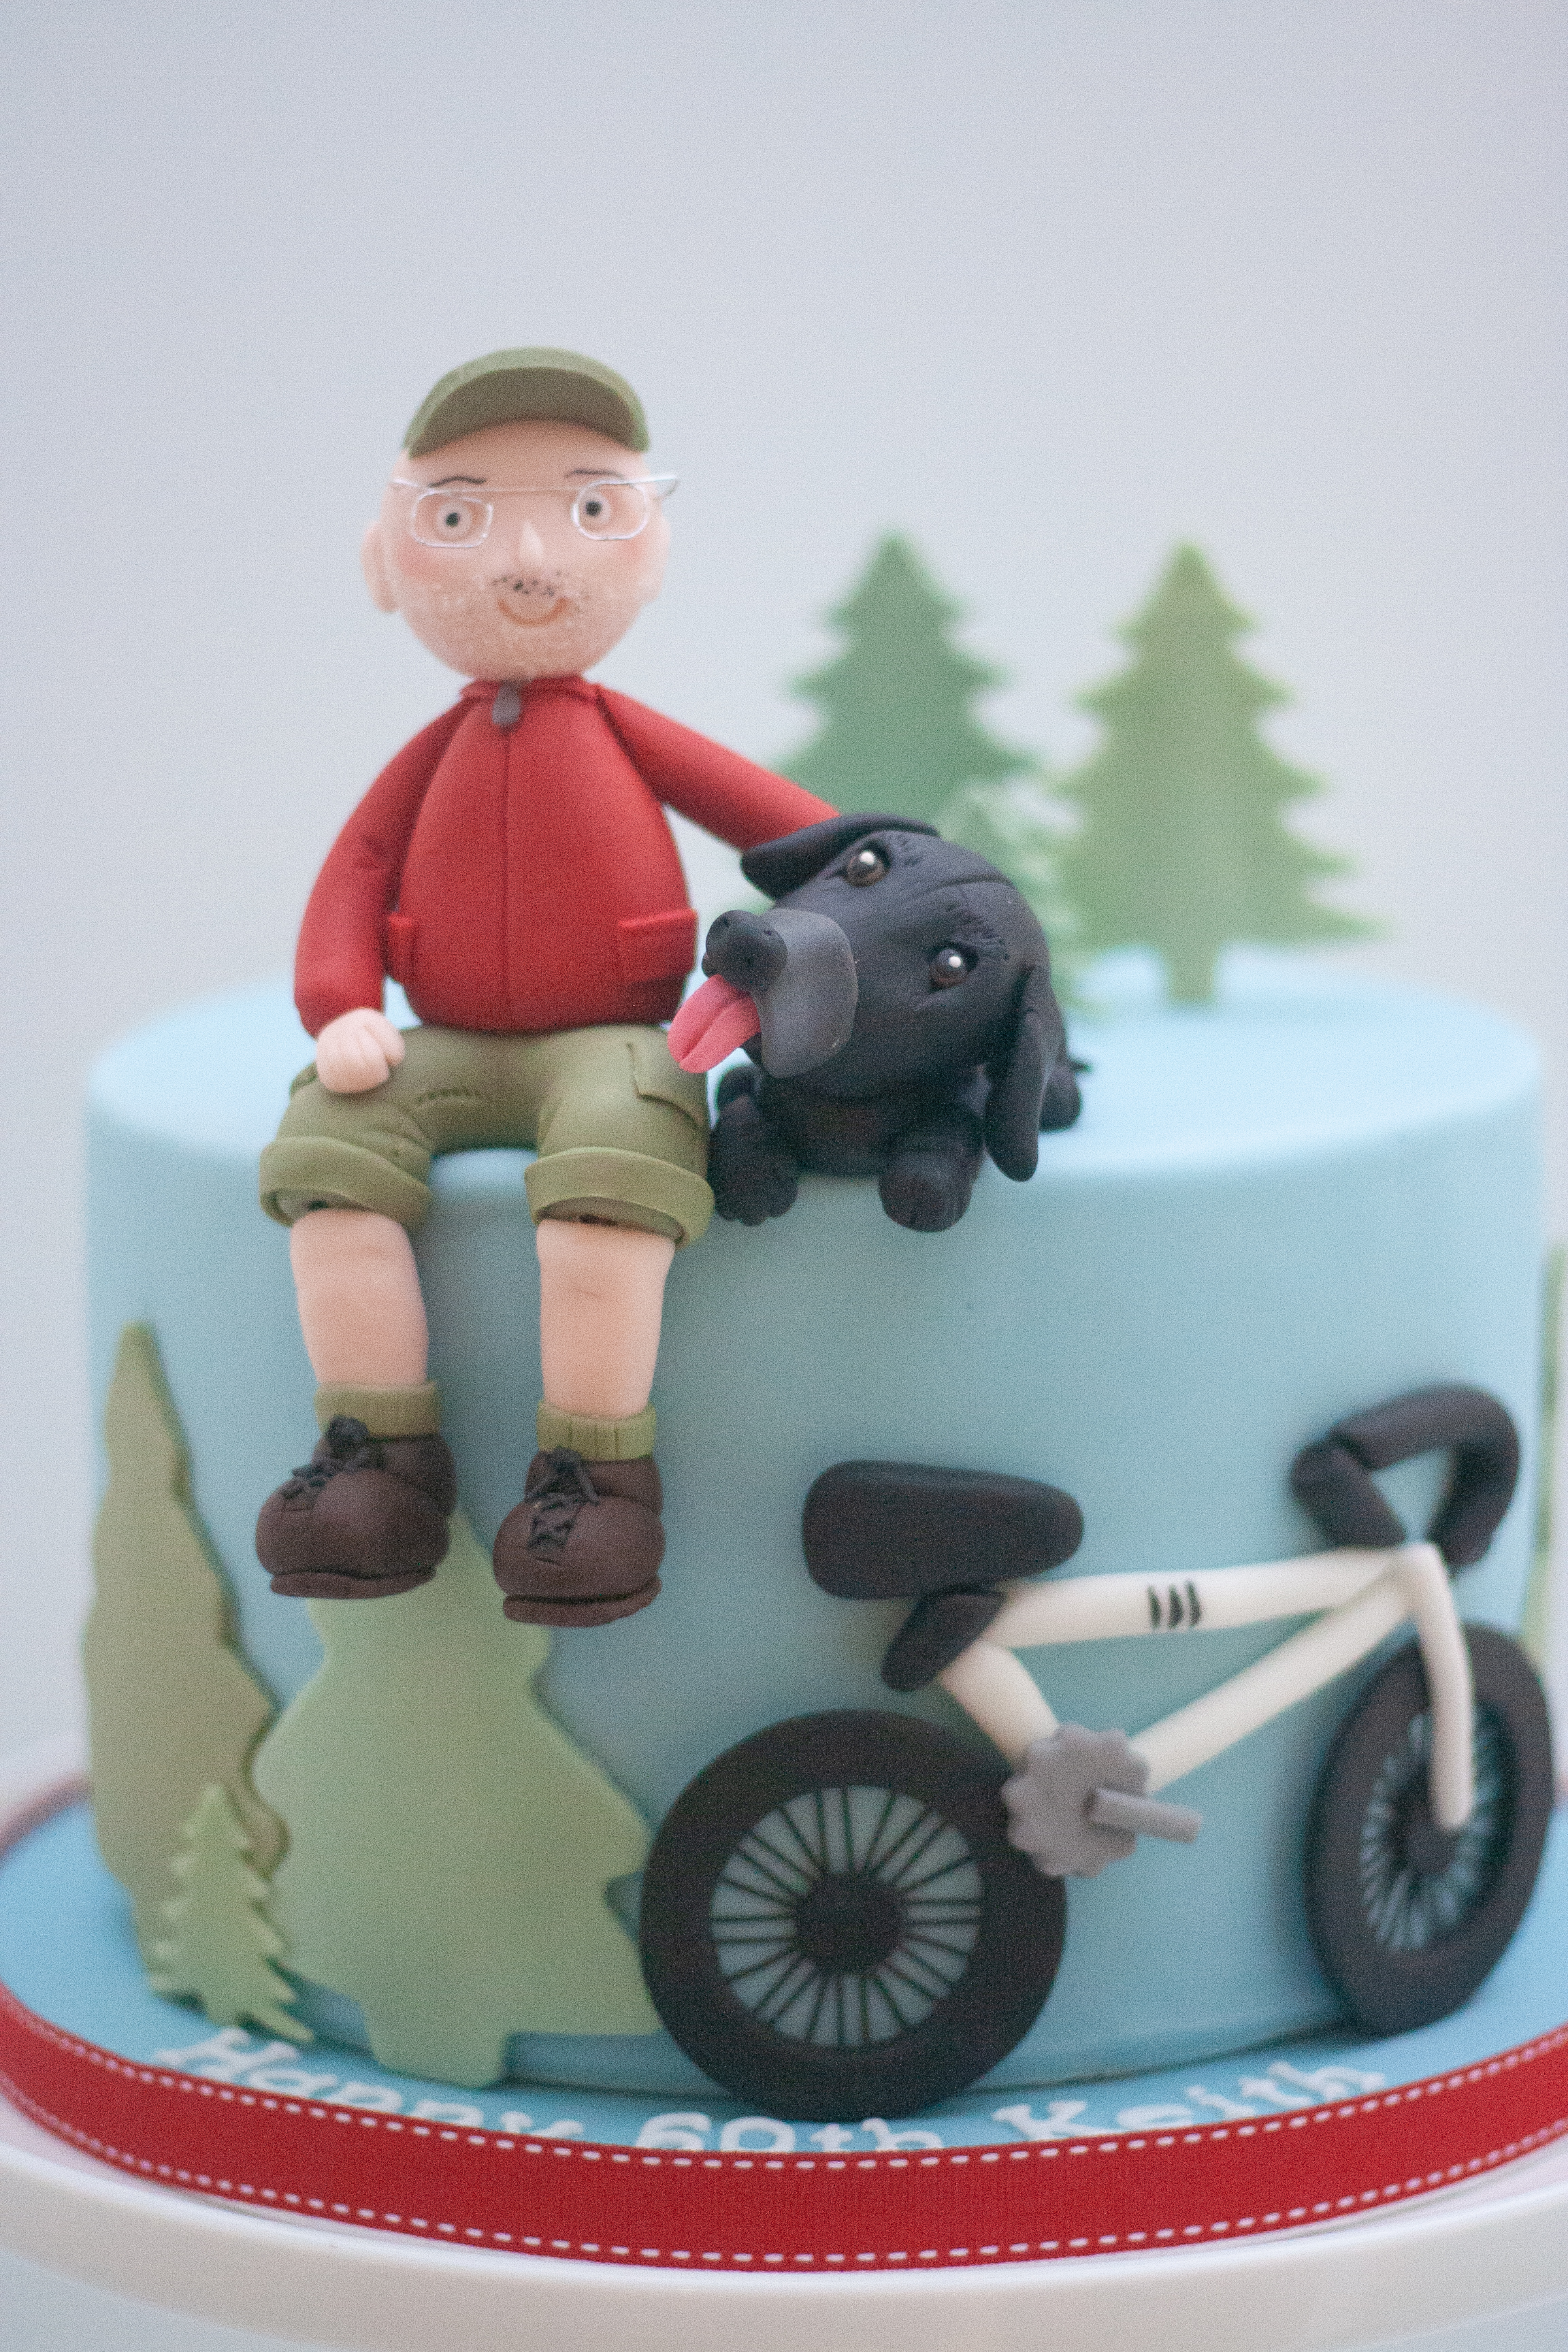 man dog bike cake